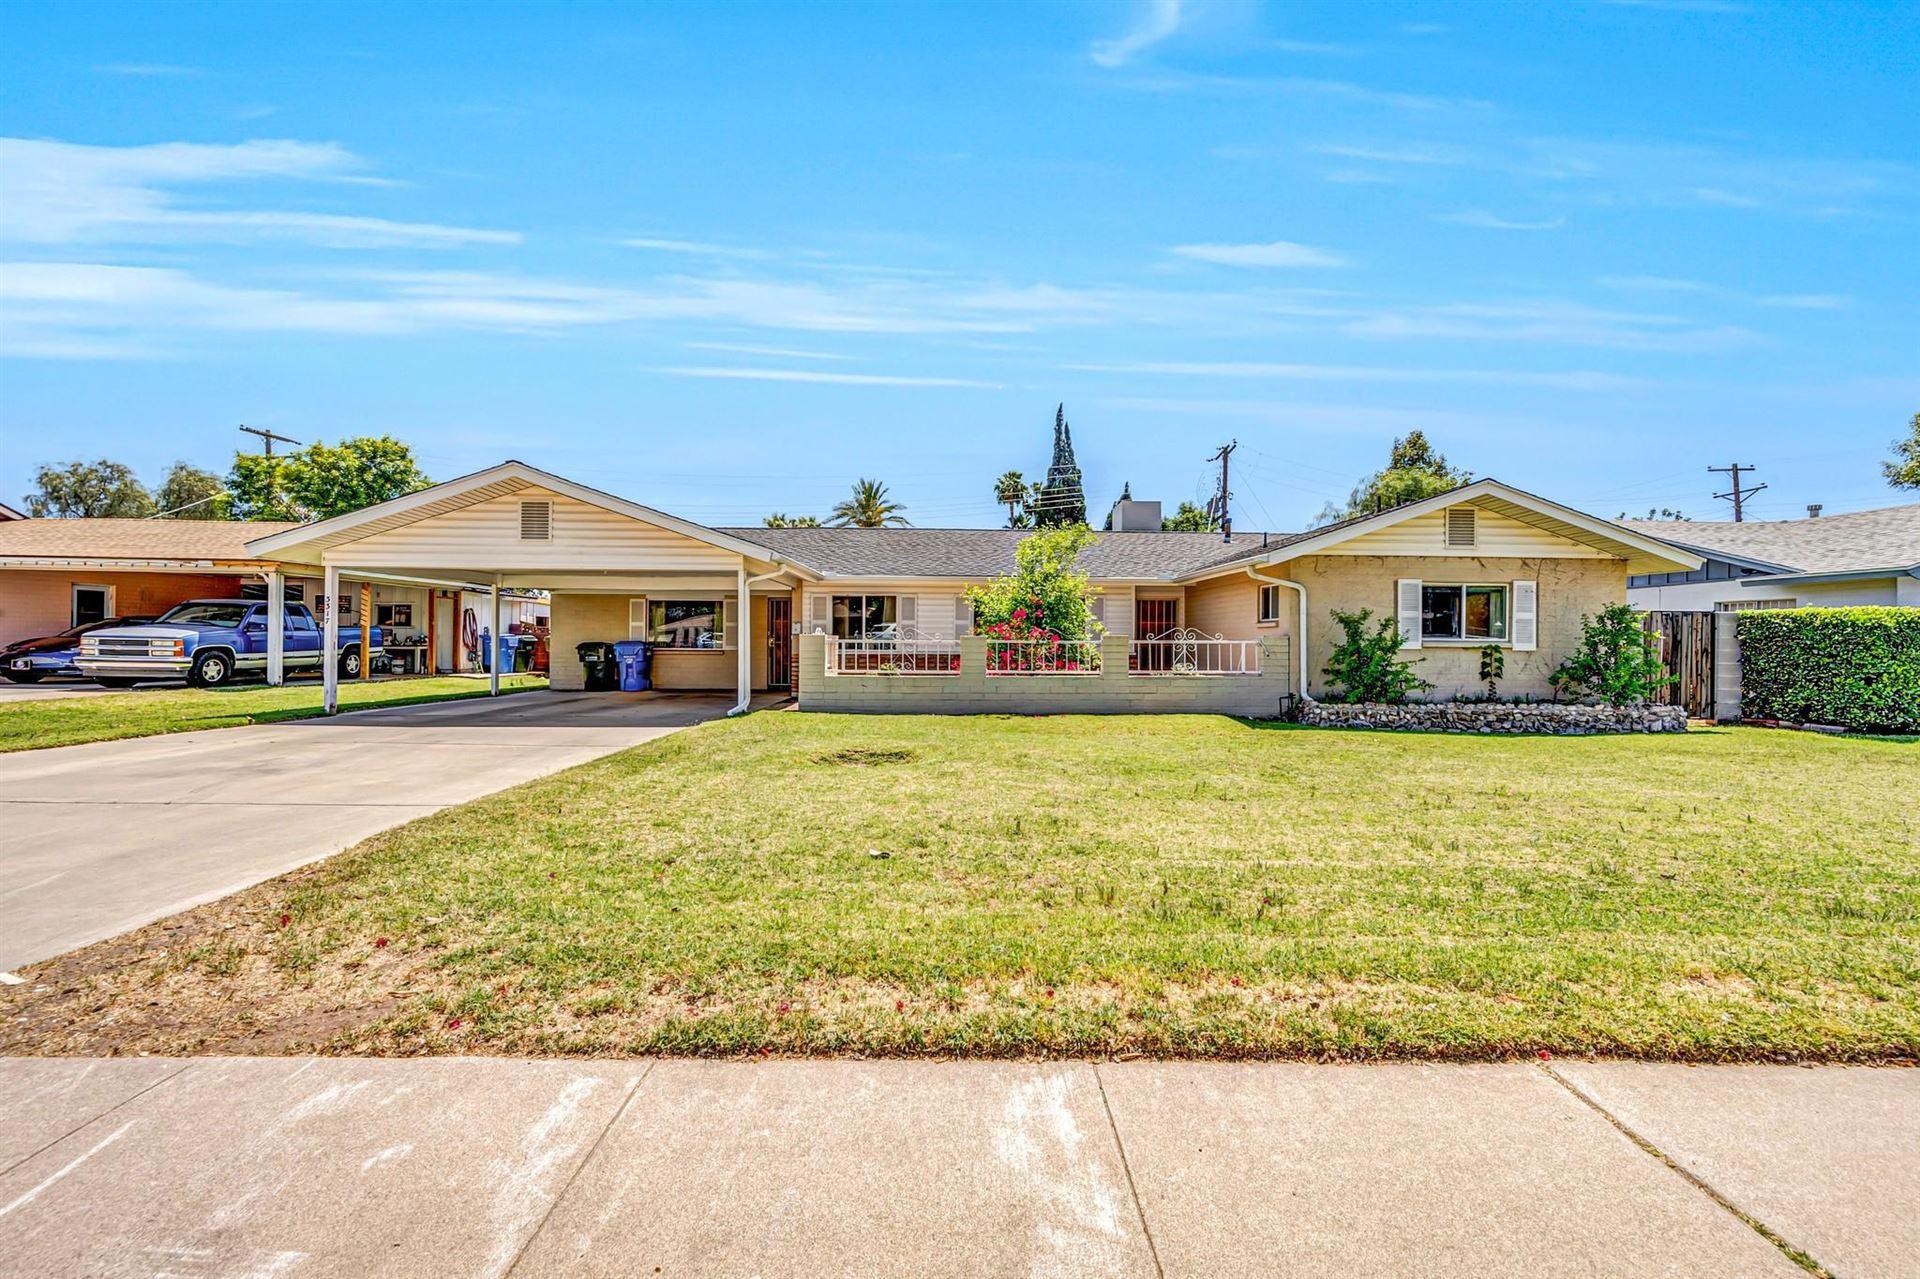 3317 E FLOWER Street, Phoenix, AZ 85018 - MLS#: 6232234